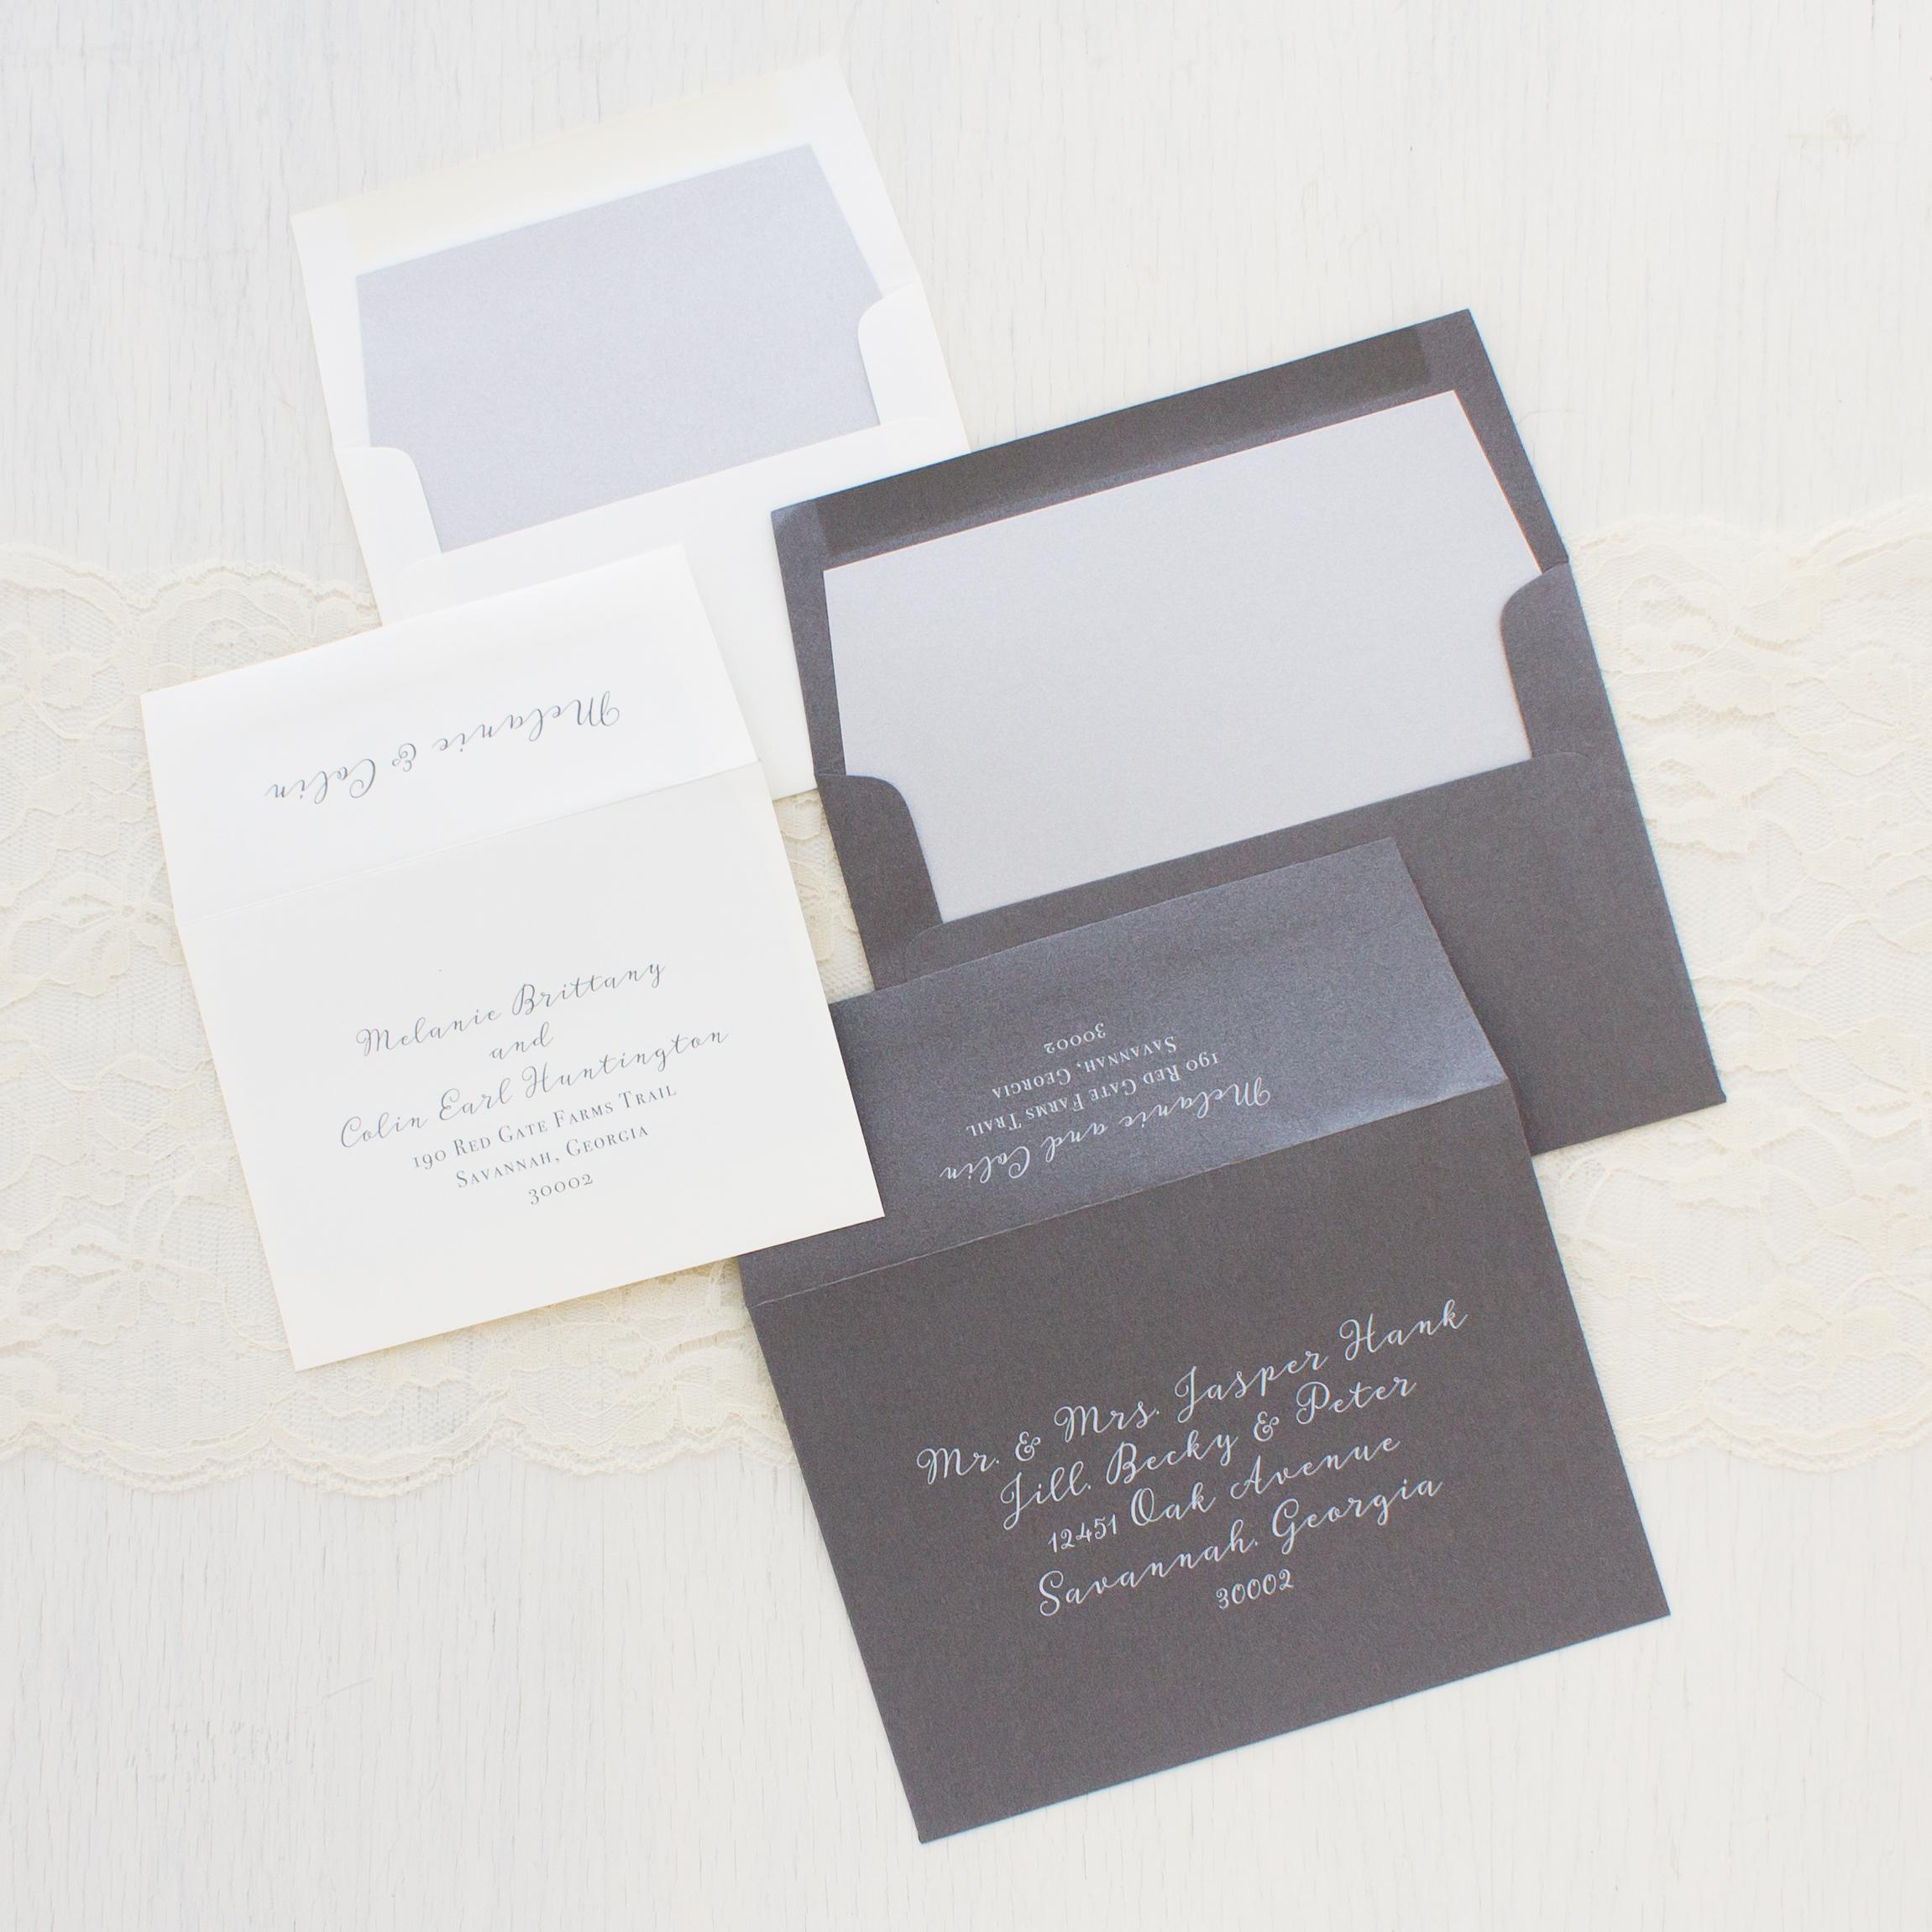 Gold Vintage Wedding Invitations | Beacon Lane